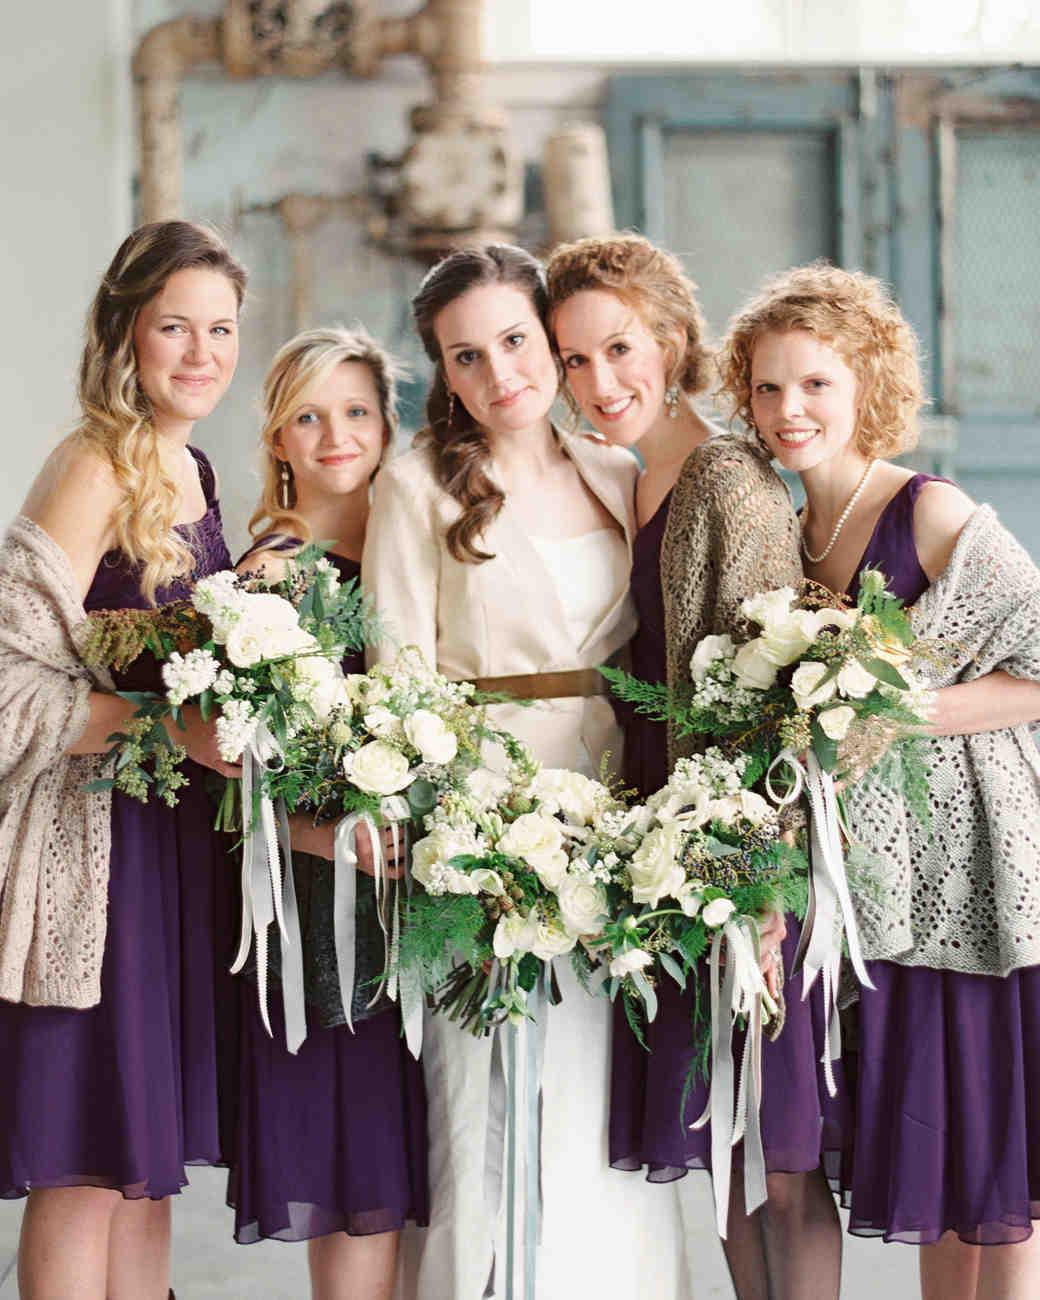 coleen-brandon-wedding-bridesmaids-0614.jpg